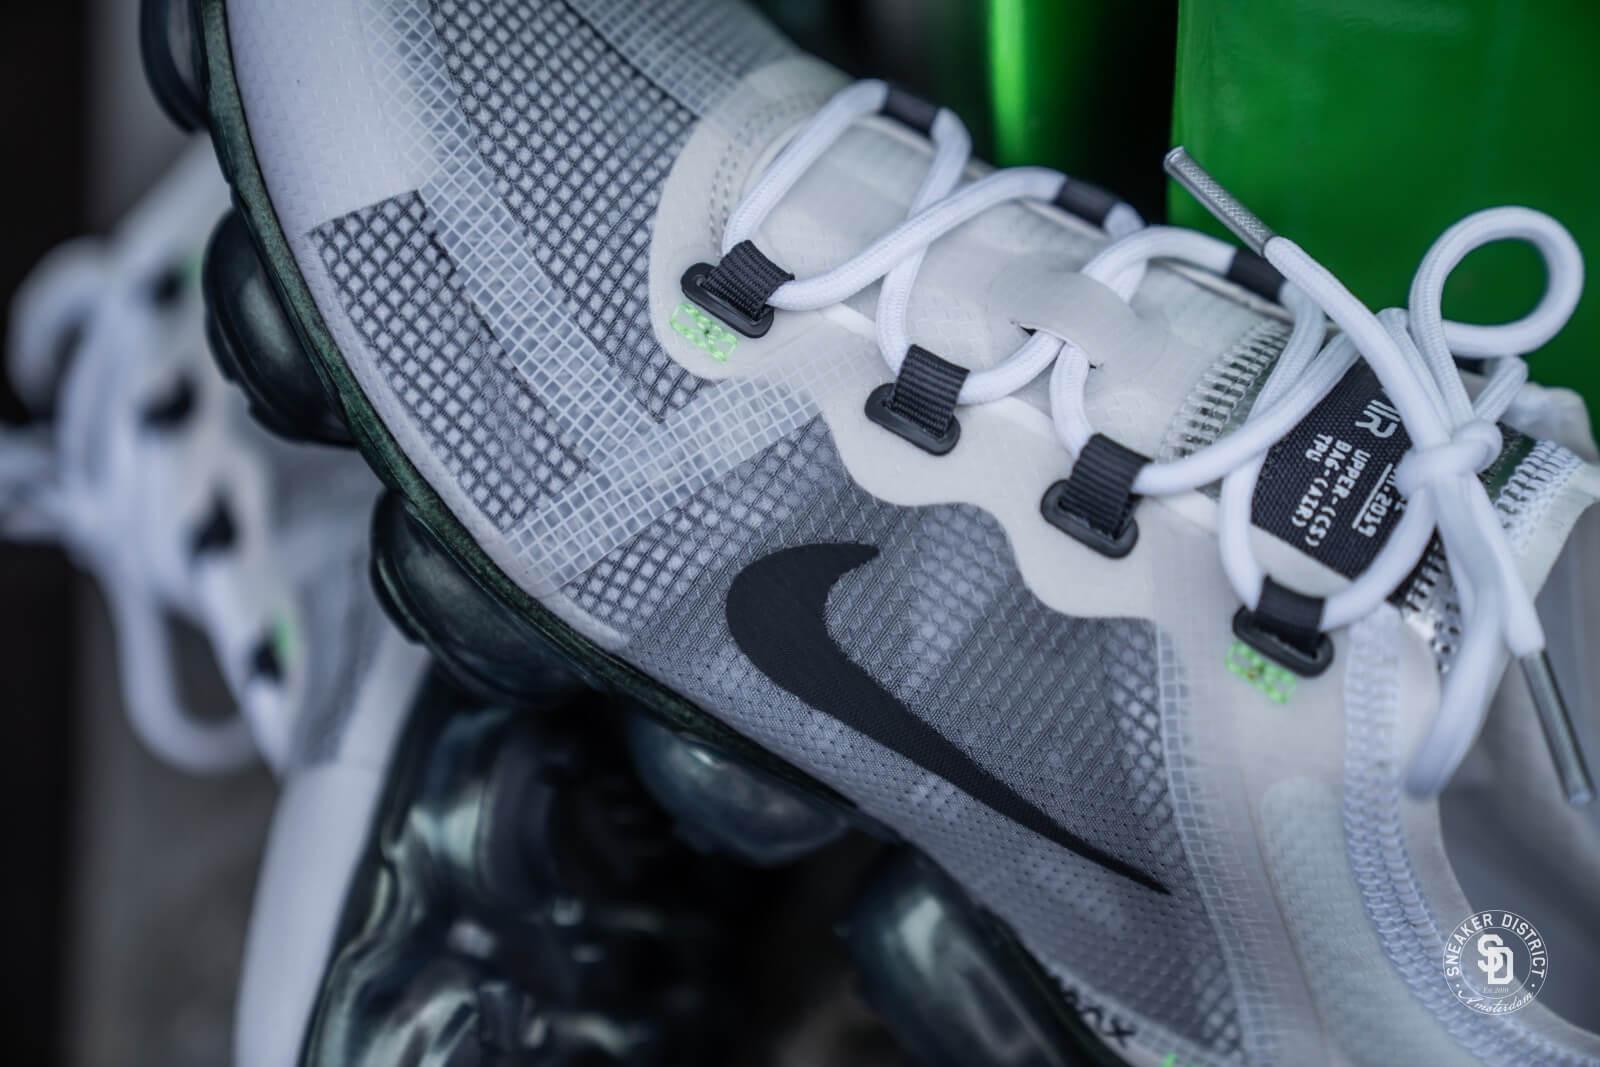 Nike Air Vapormax 2019 Premium White